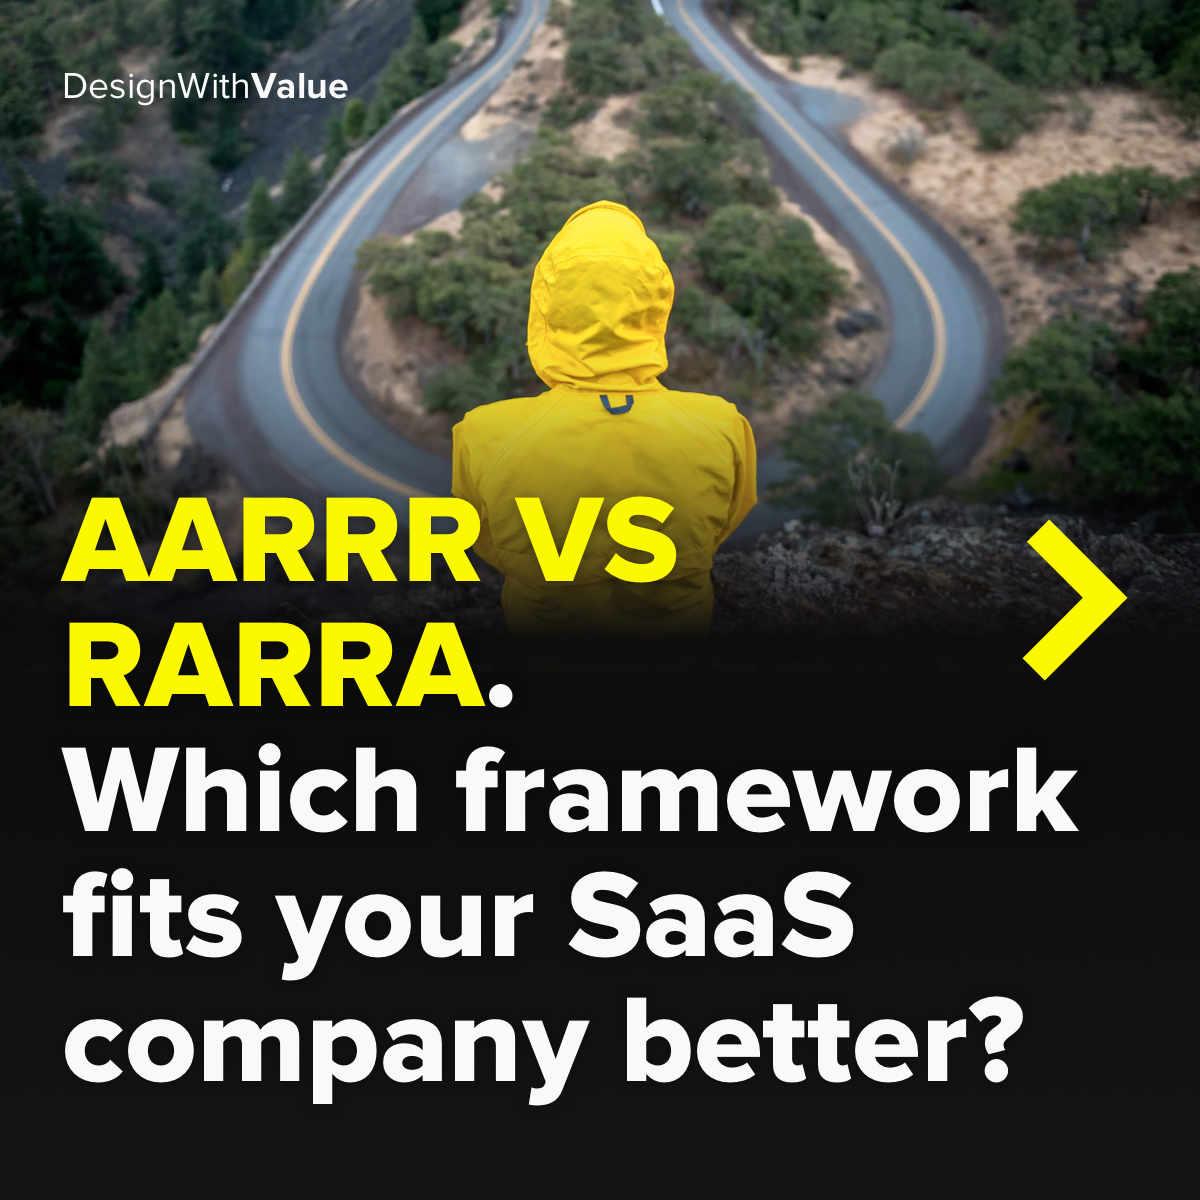 AARRR vs RARRA. Which framework fits your saas company better?